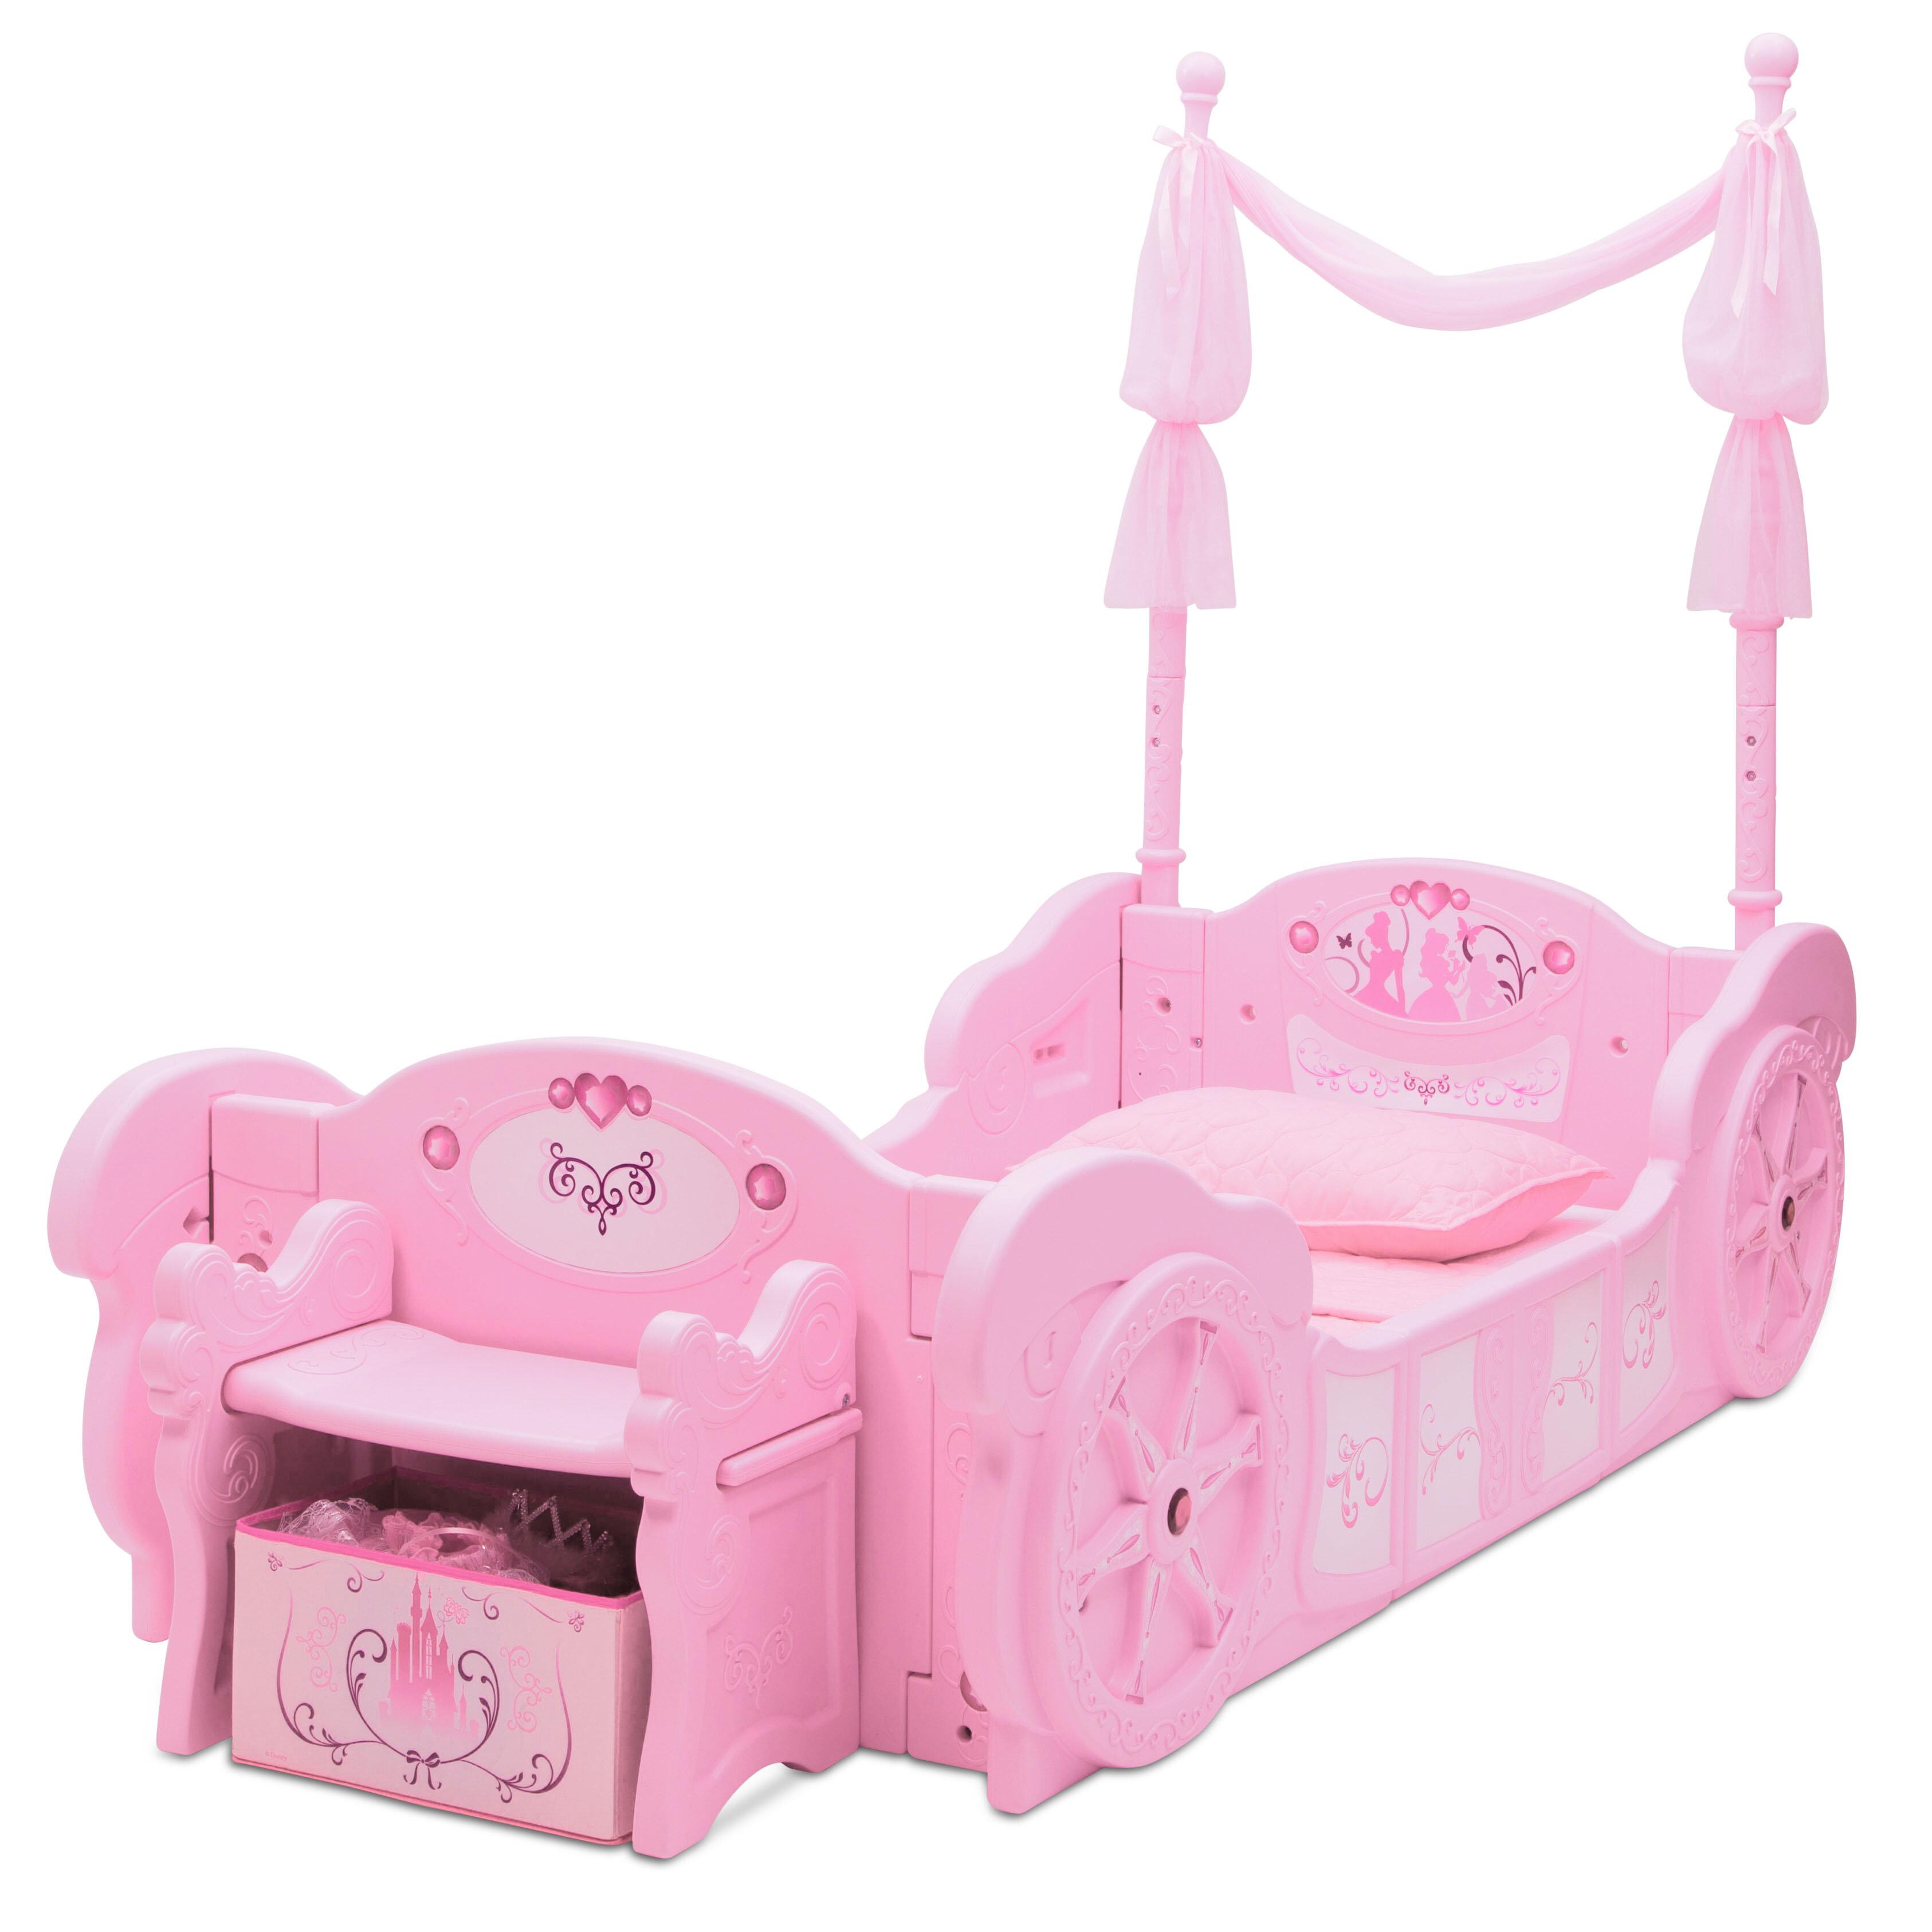 finest selection 2a0bf 5e8bb Disney Princess Carriage Convertible Toddler Bed